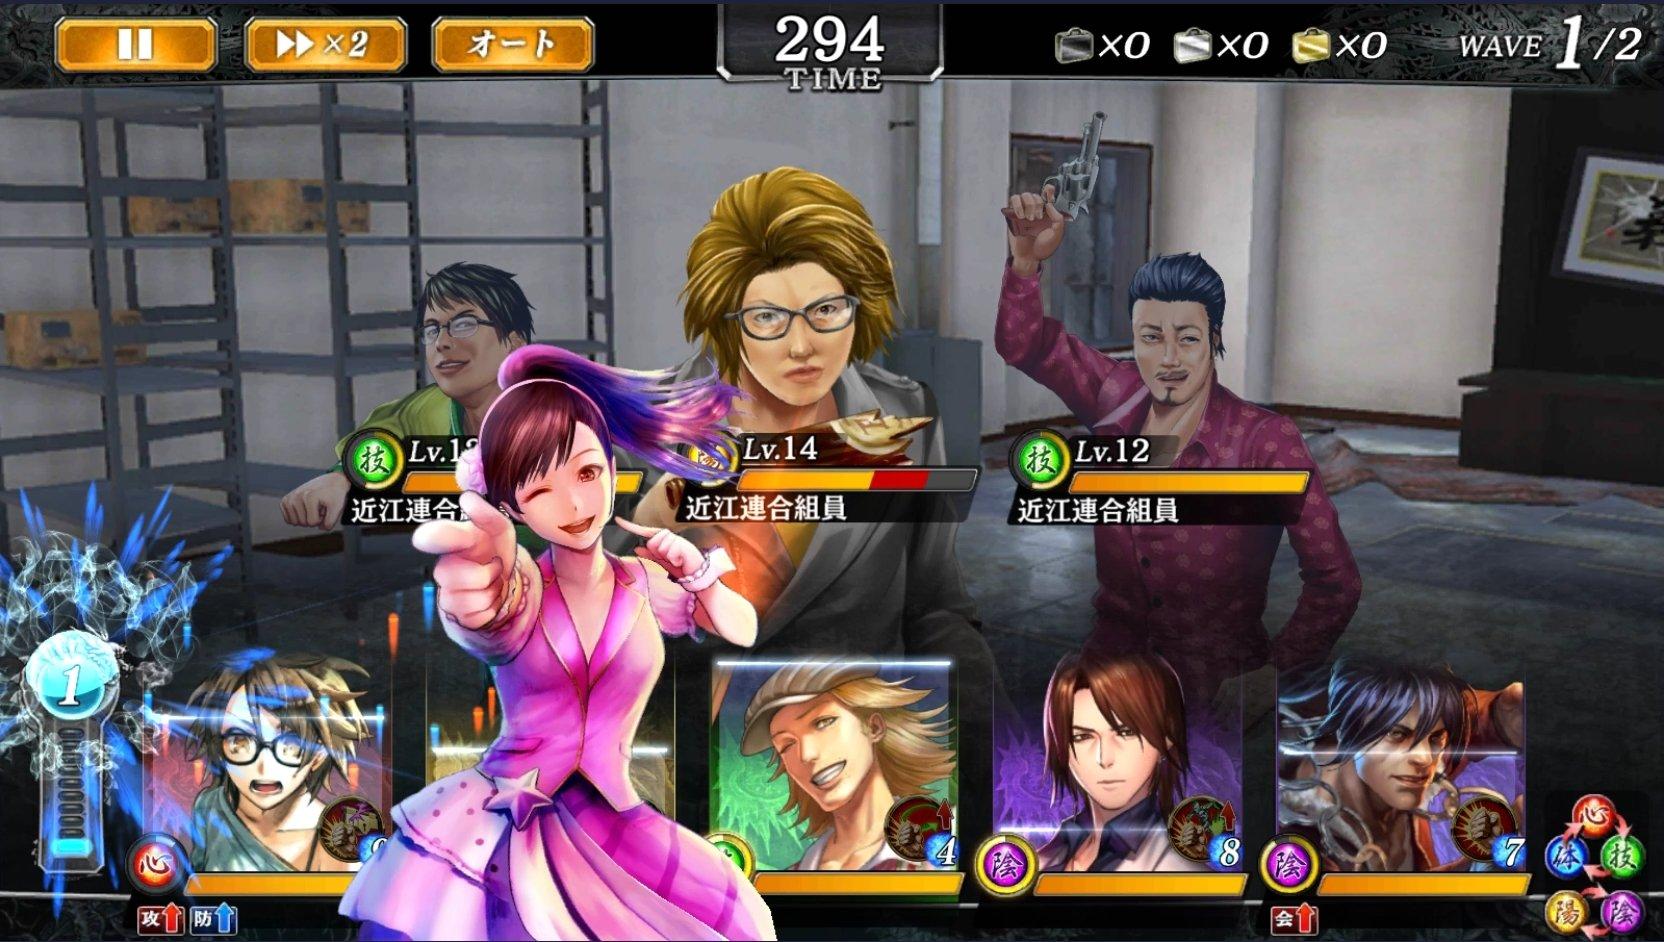 Yakuza Online Ryu Ga Gotoku online review Battle System